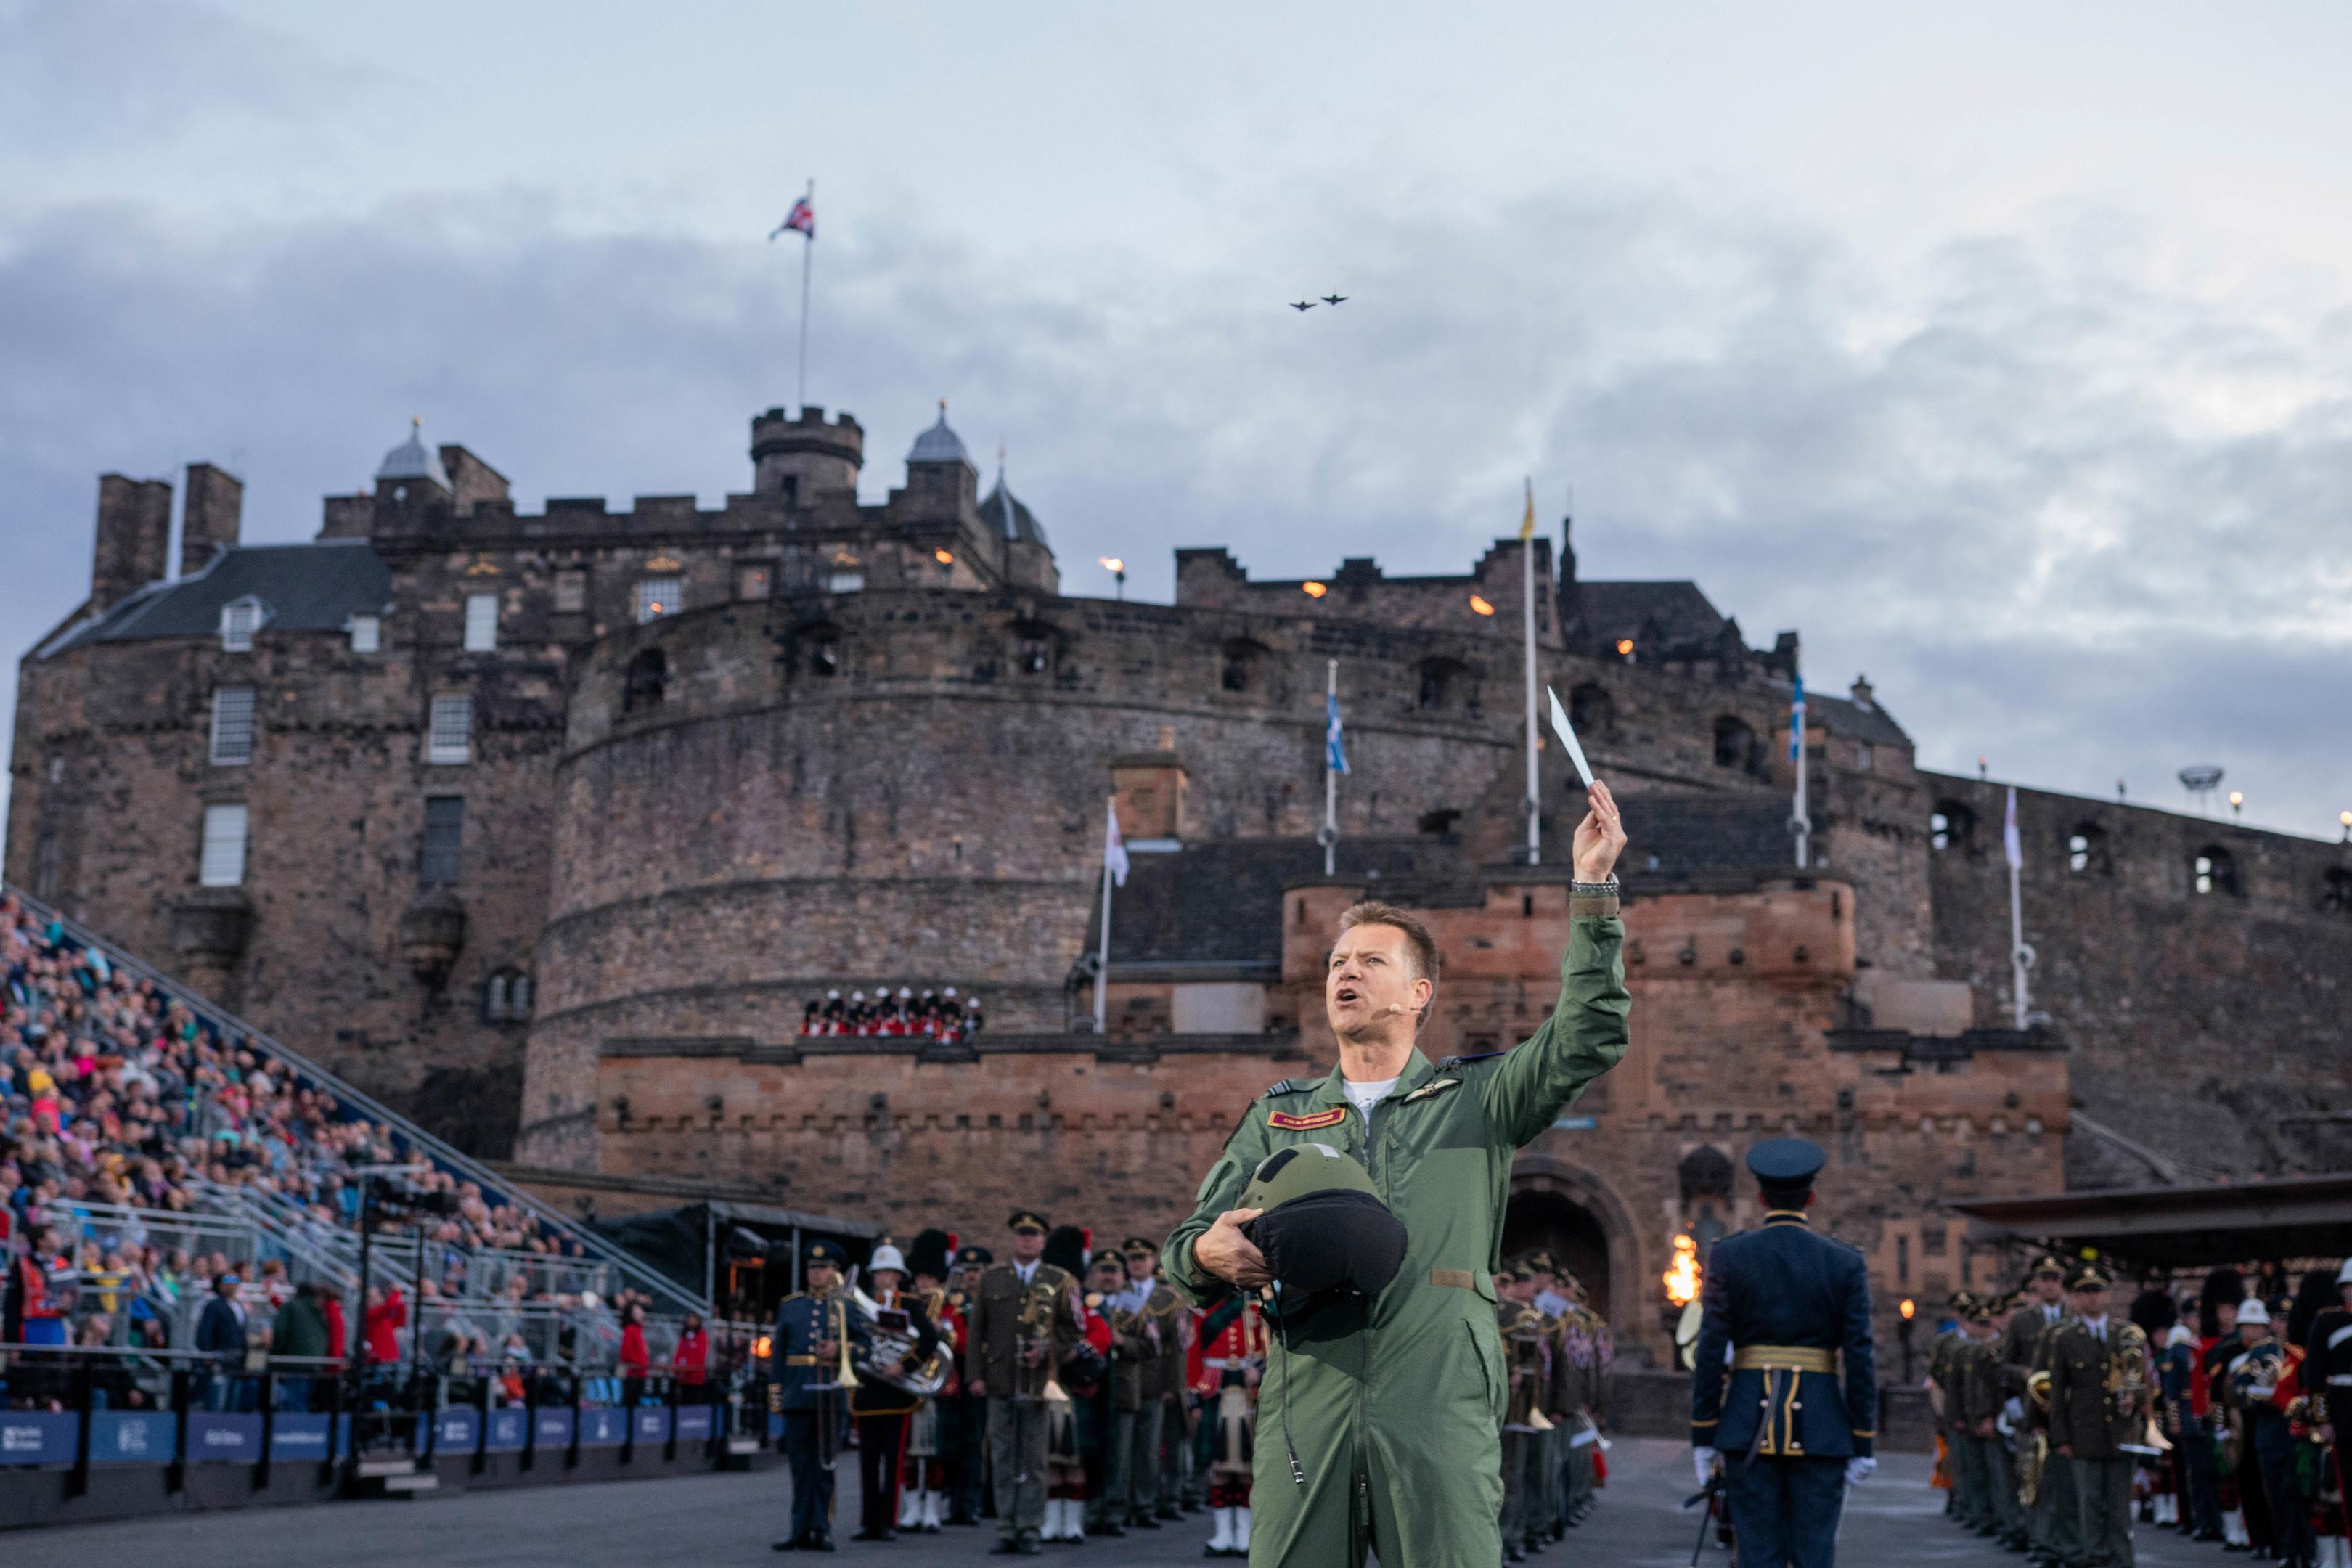 Colin recites the poem (The Royal Edinburgh Military Tattoo)